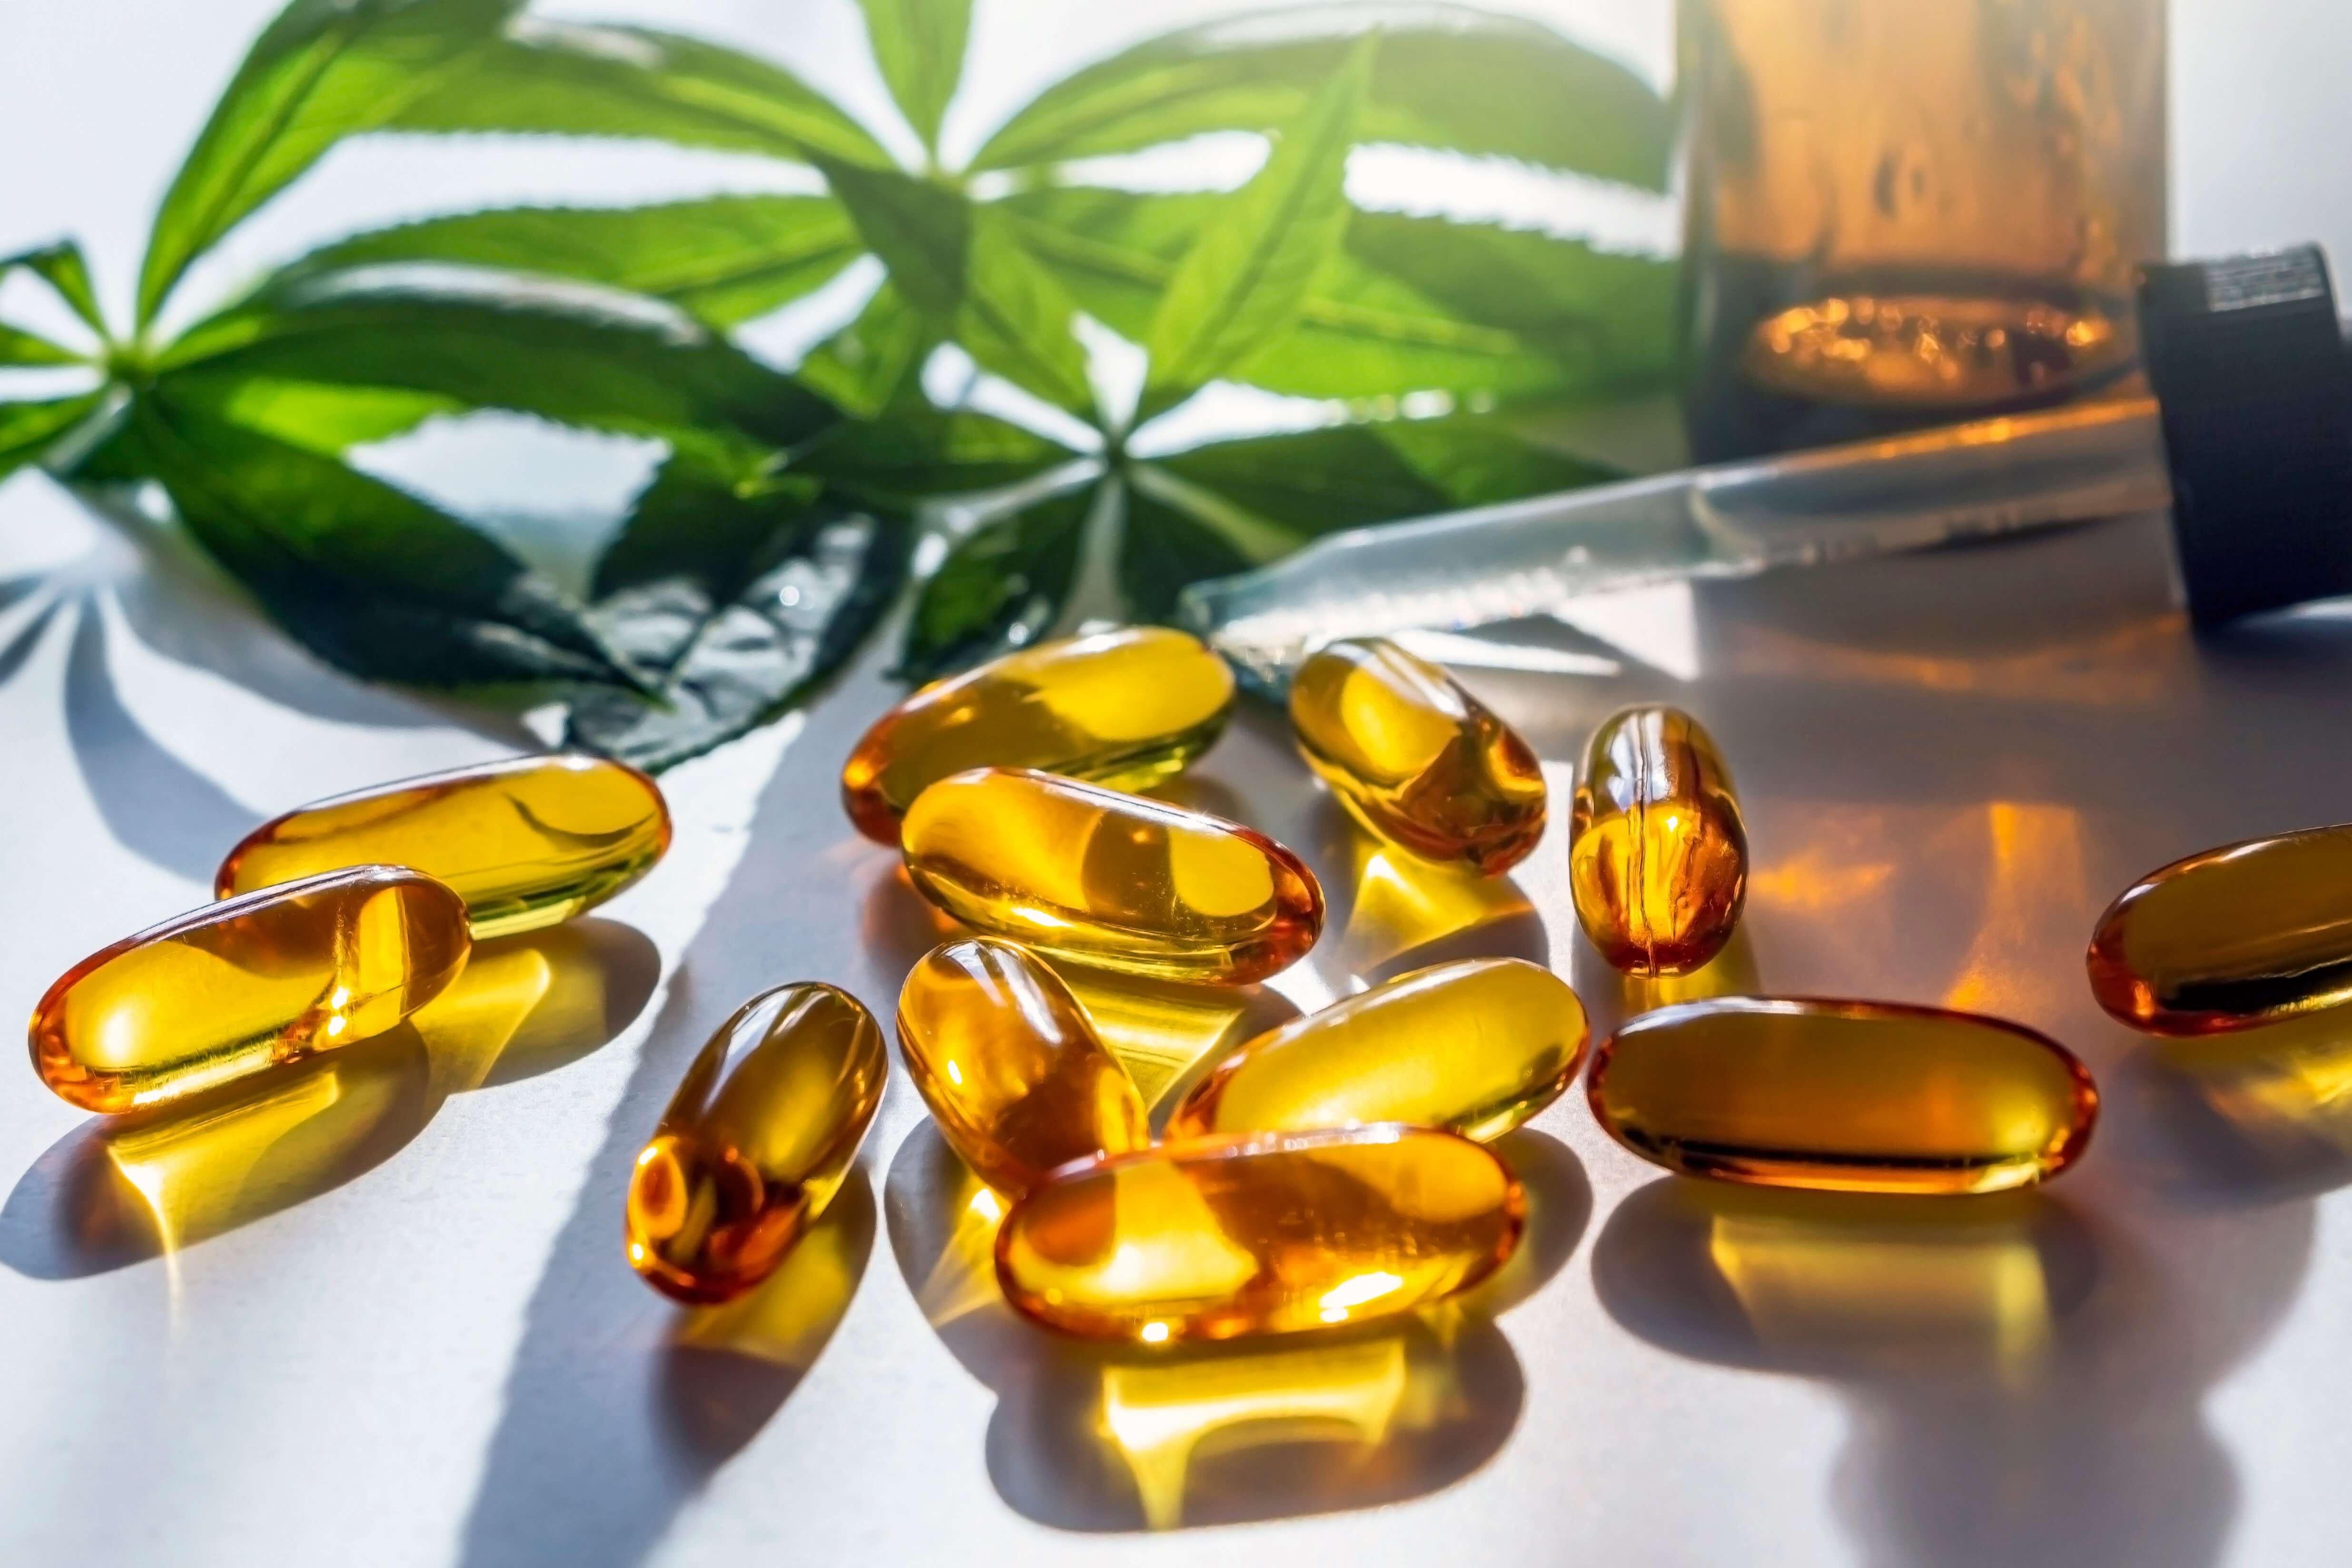 Medical marijuana oil pills